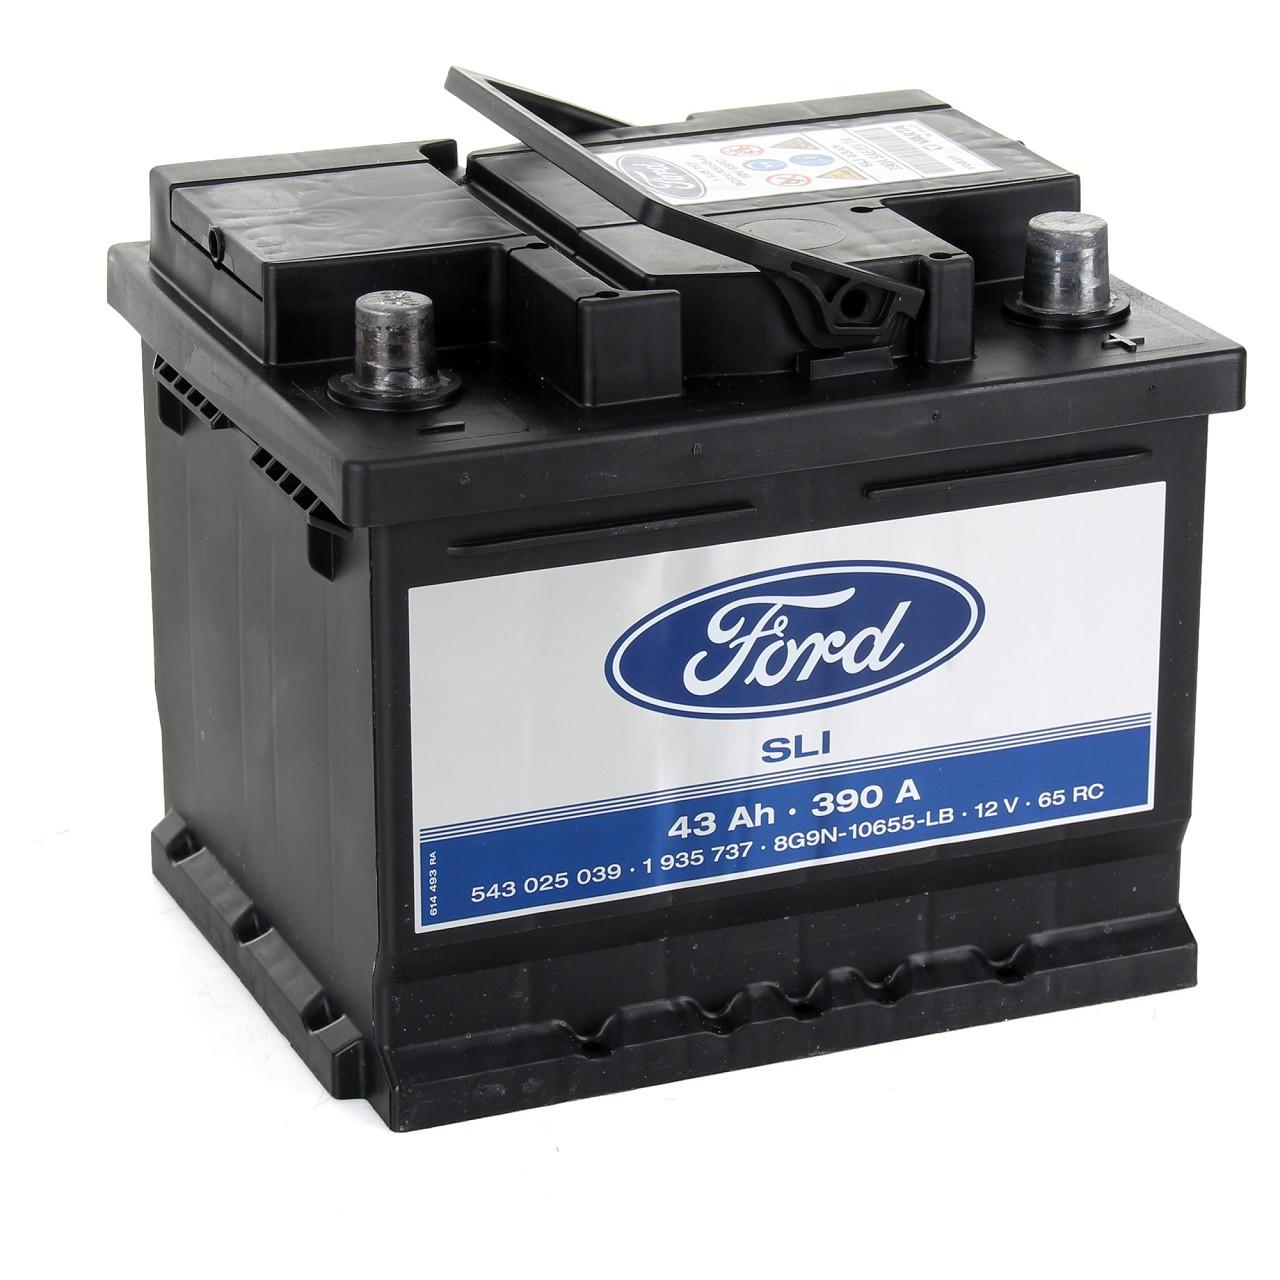 ORIGINAL Ford Autobatterie Batterie Starterbatterie 12V 43Ah 390A 1935737